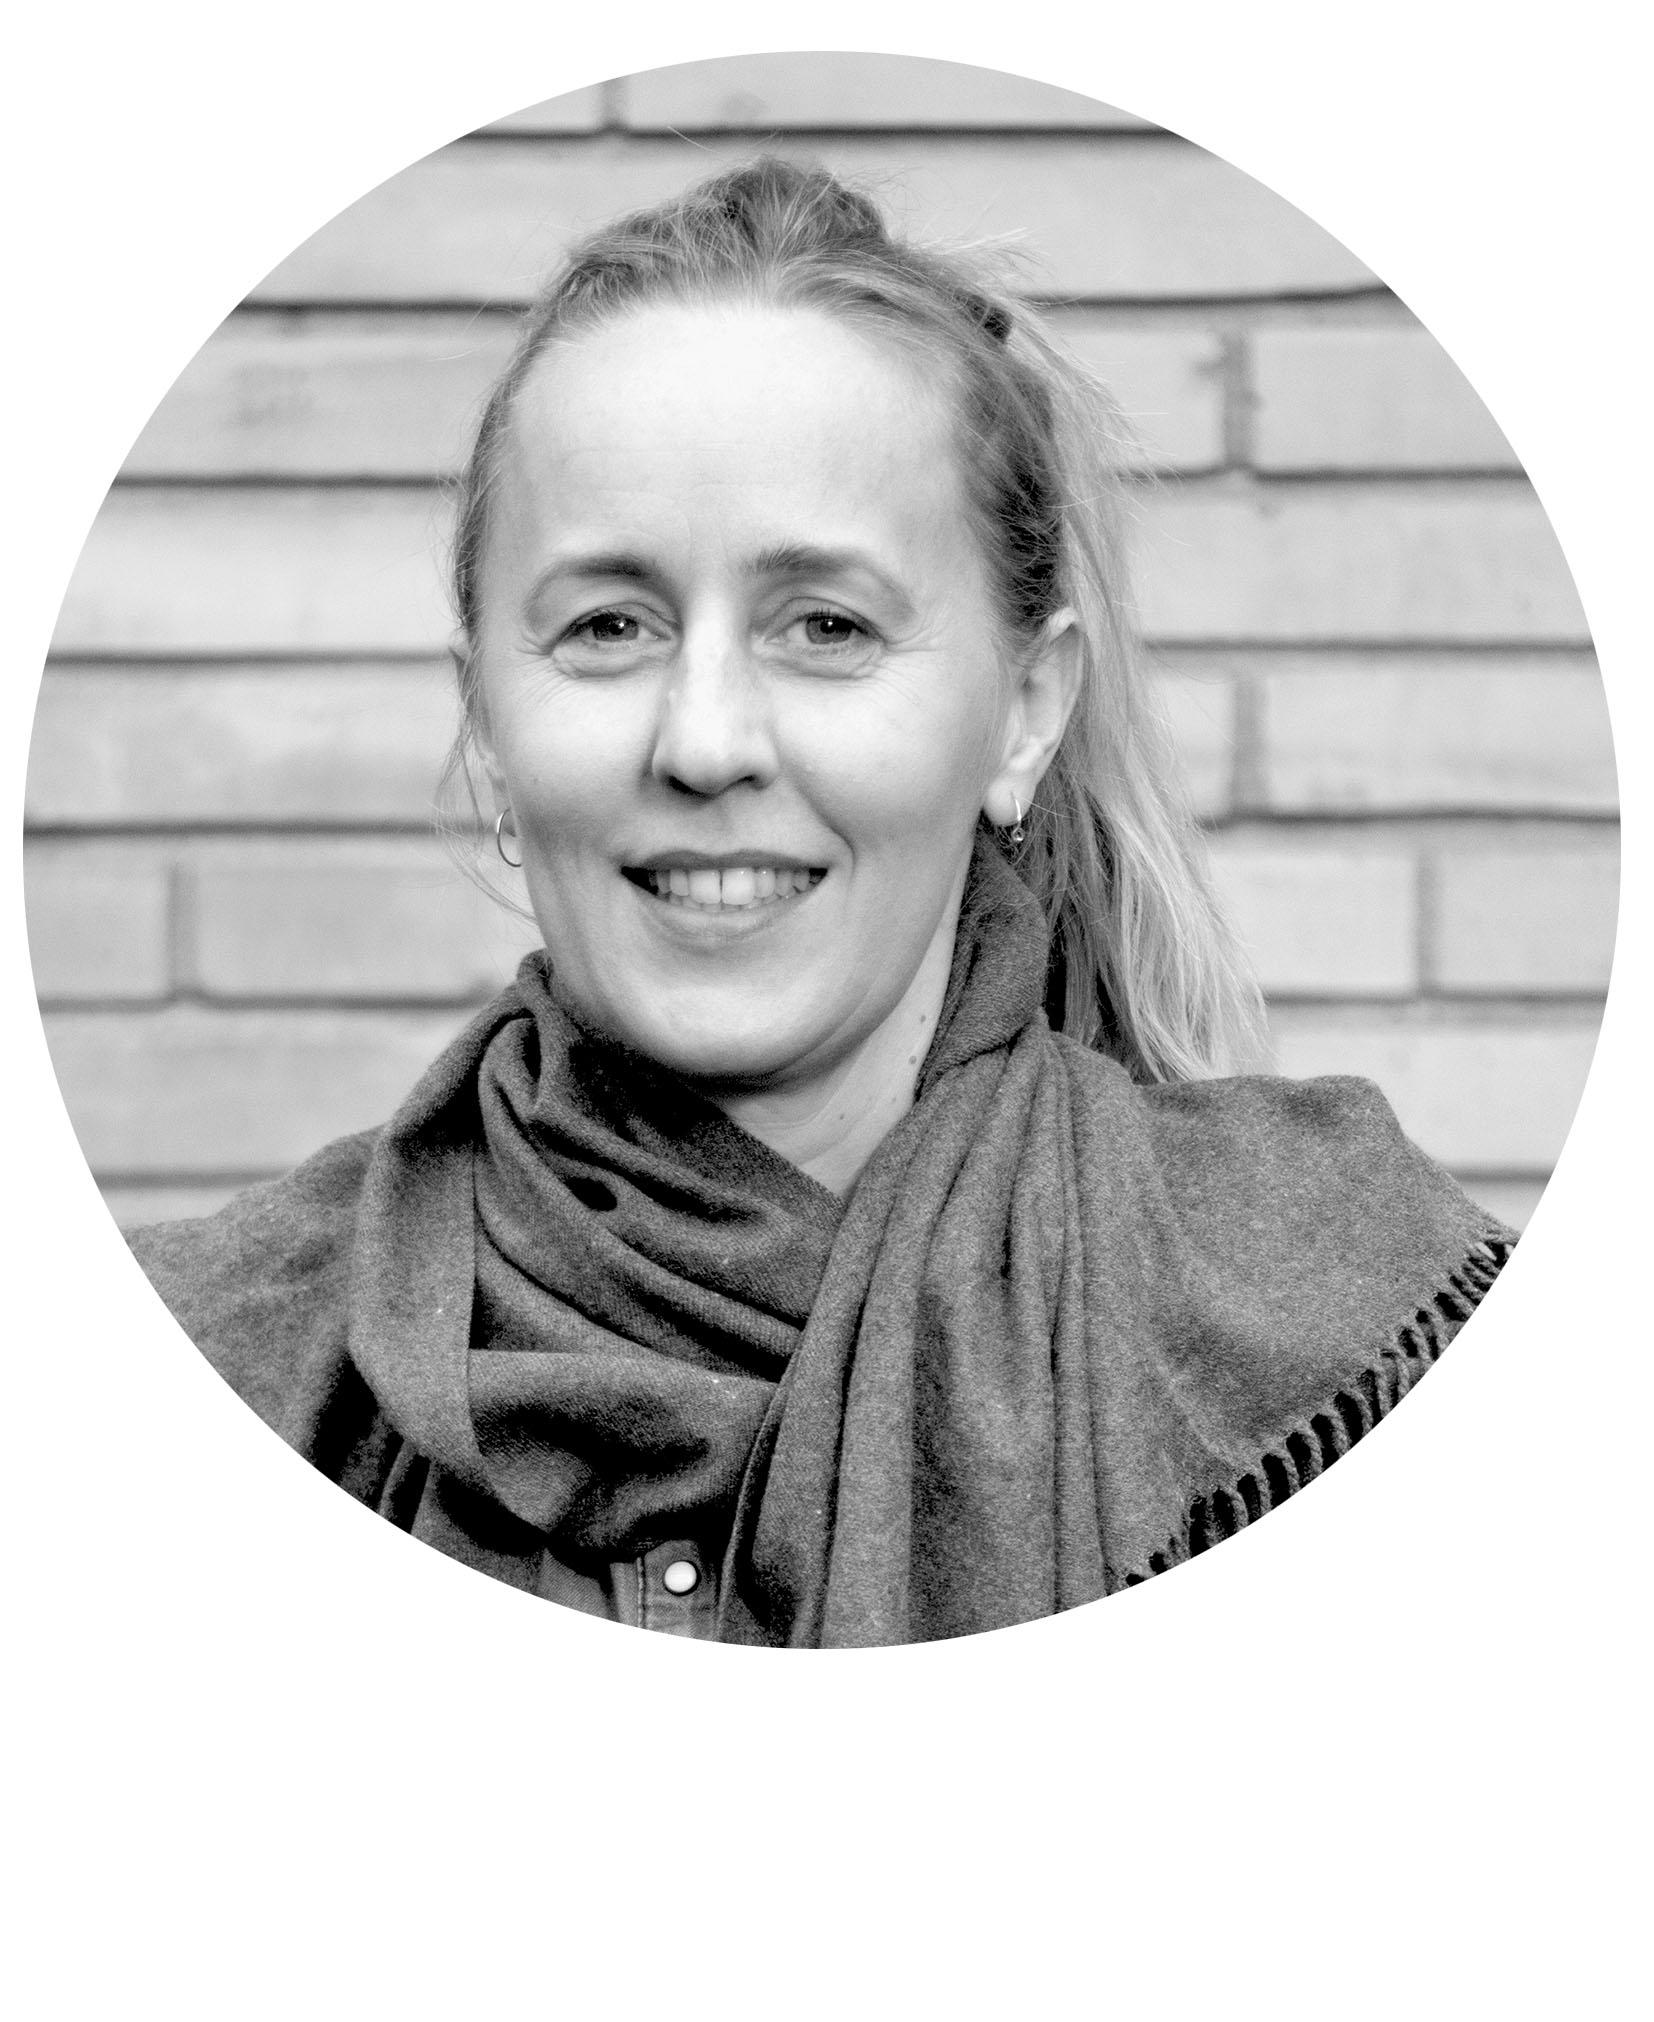 Kathrine Bøegh-Nielsen